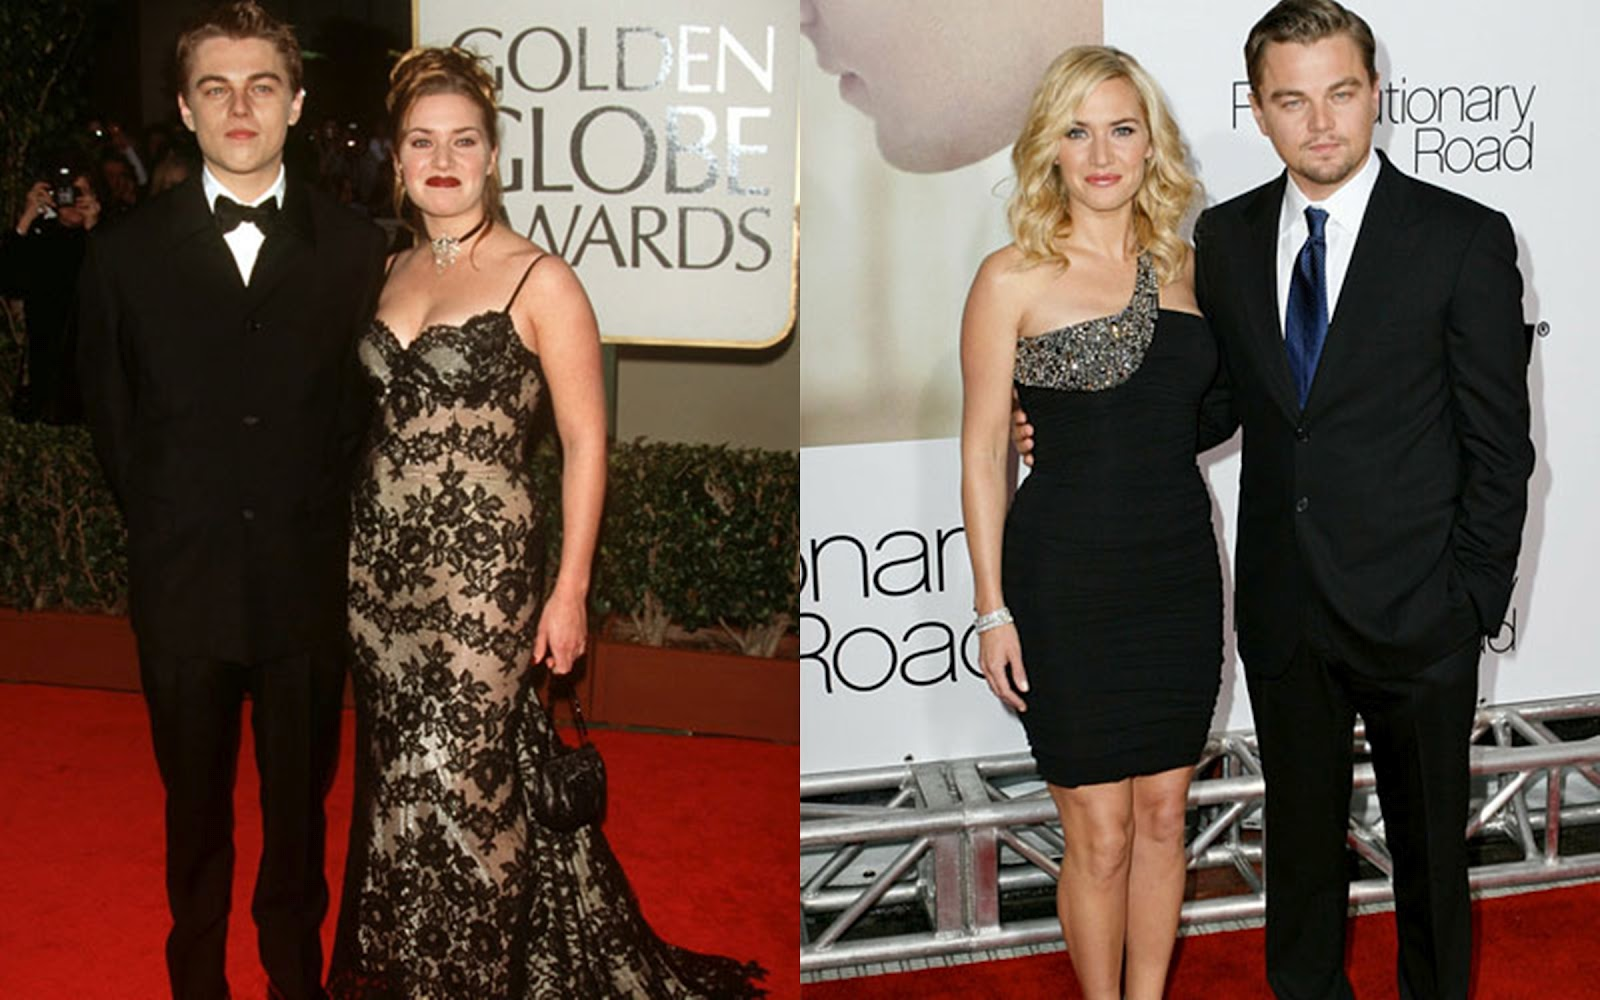 http://2.bp.blogspot.com/-GhOP9I_CgfU/T4PNdVty8kI/AAAAAAAAGaw/epbTMPZTzeI/s1600/Leonardo+DiCaprio+ve+Kate+Winslet+titanic+galalar%C4%B1.jpg